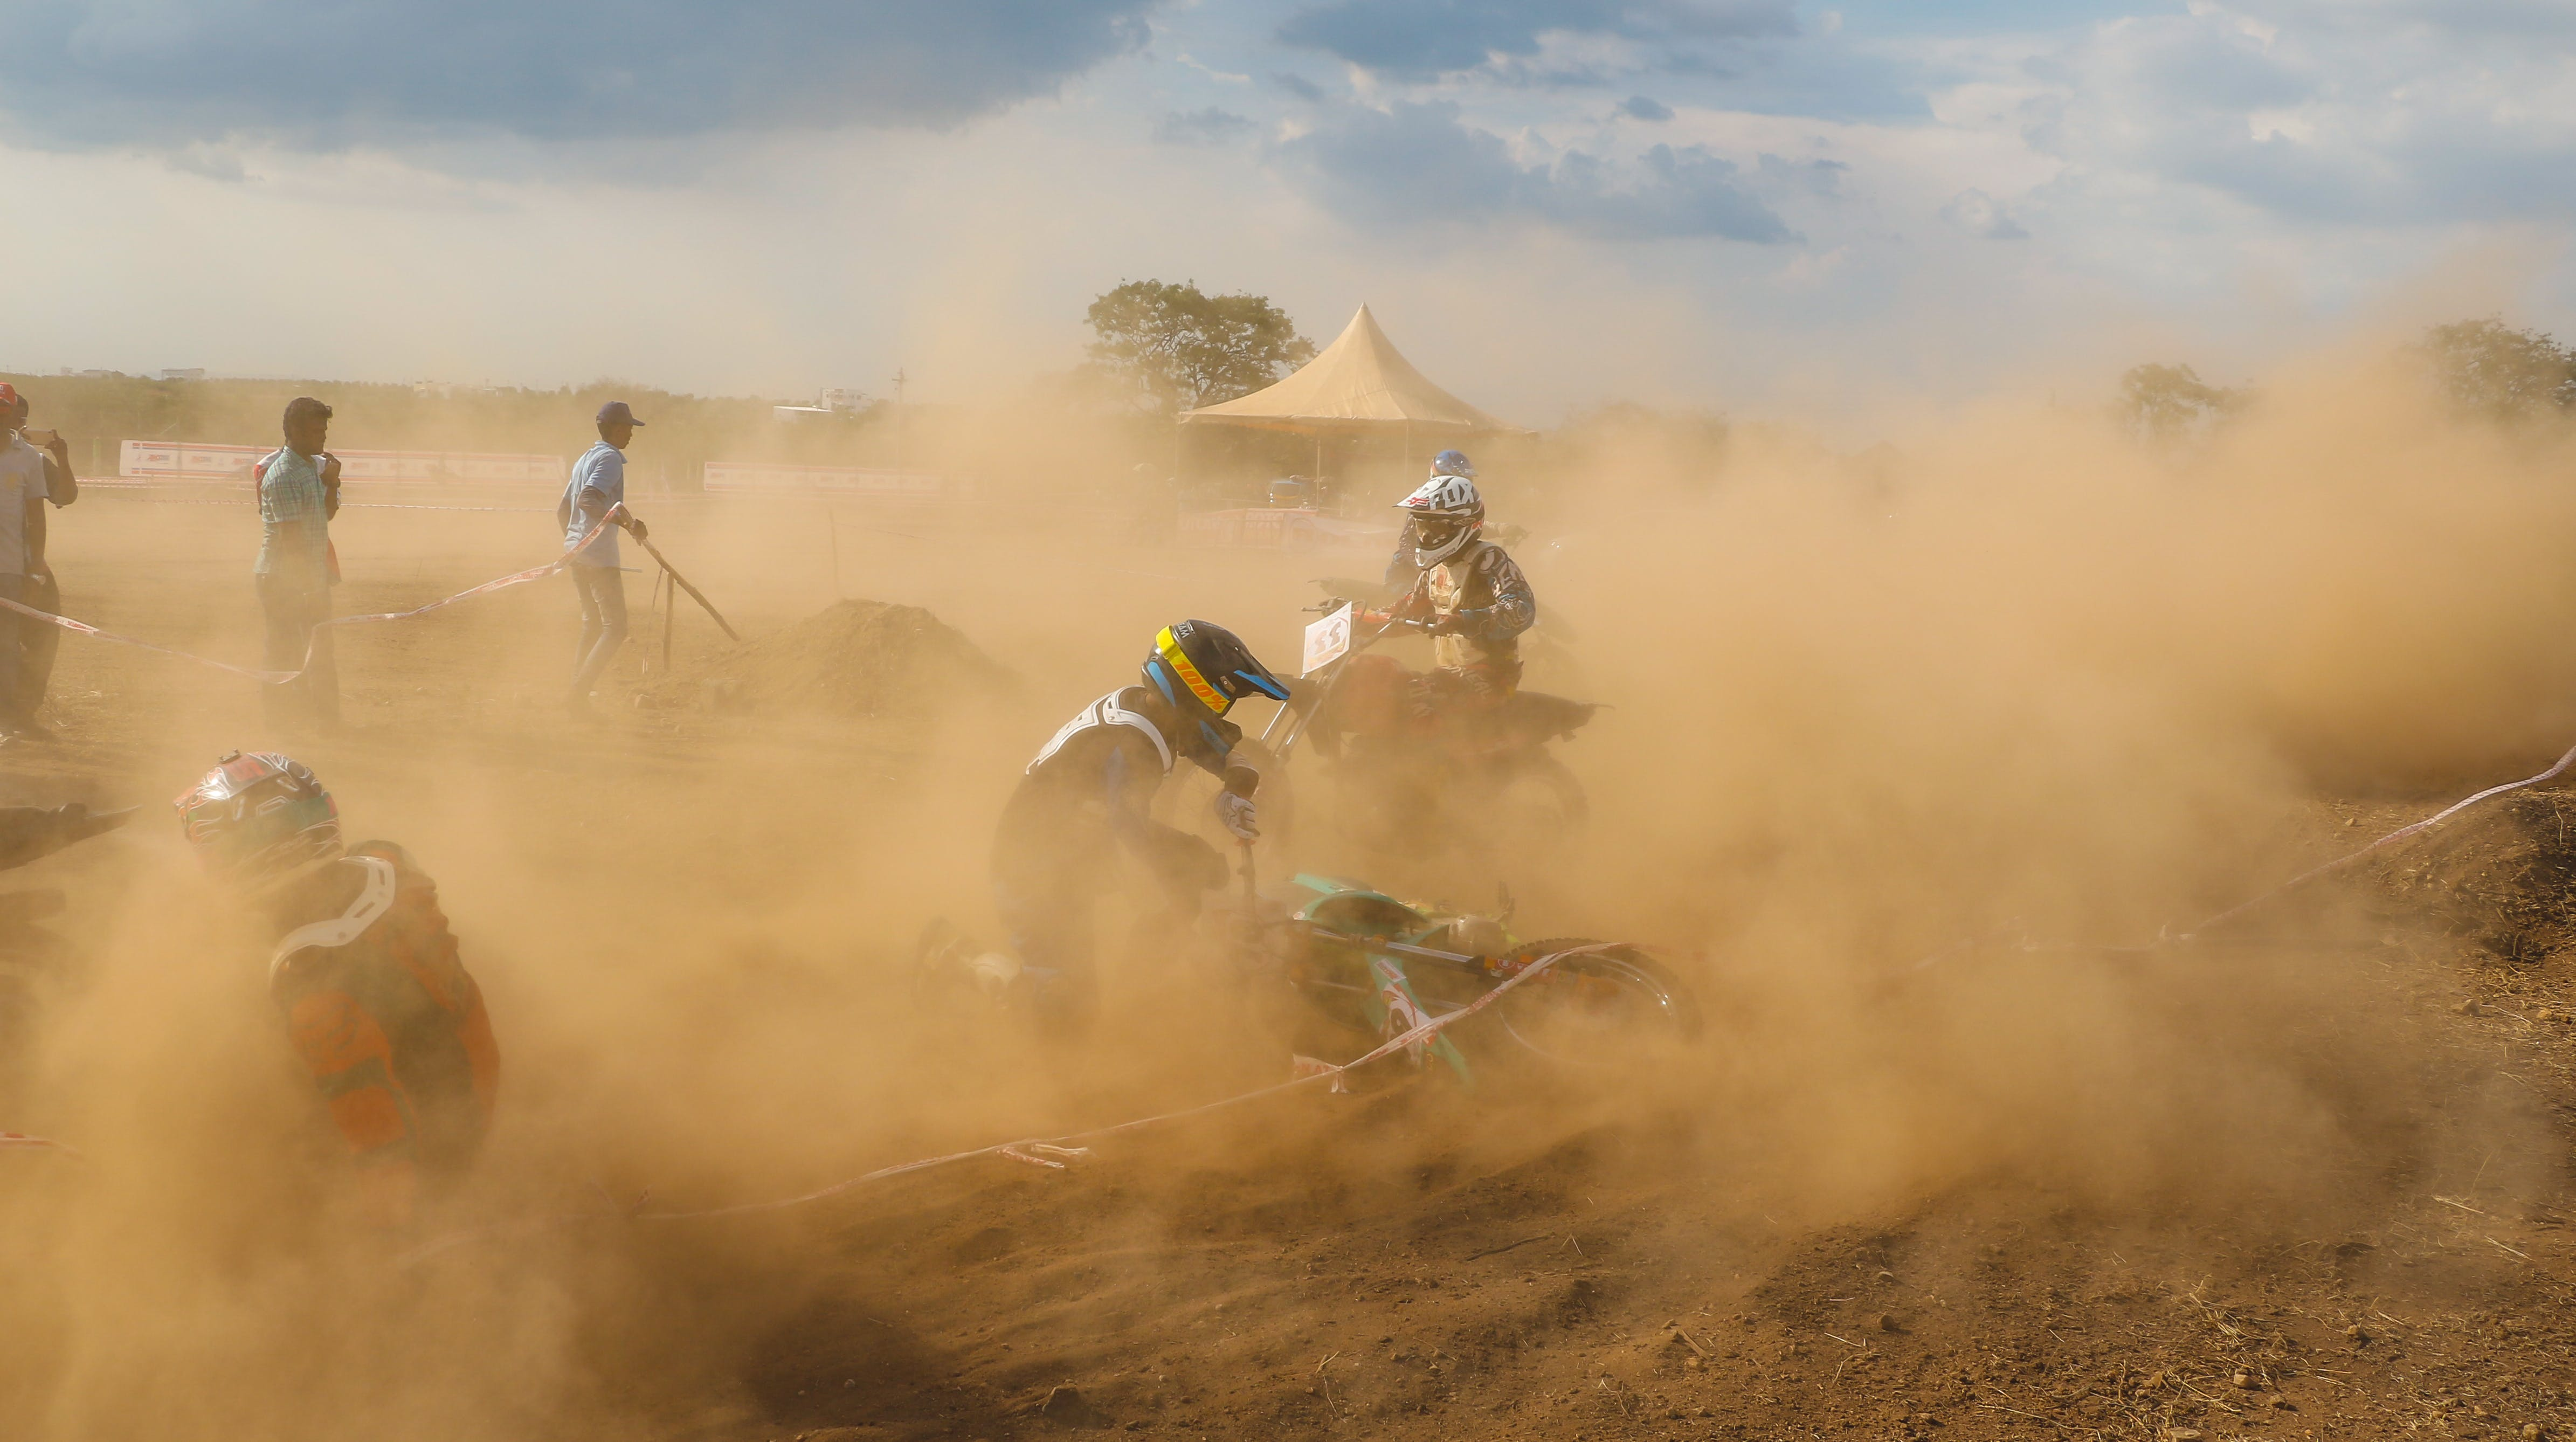 Free stock photo of bike helmet, bike racing, crash, dirt bike